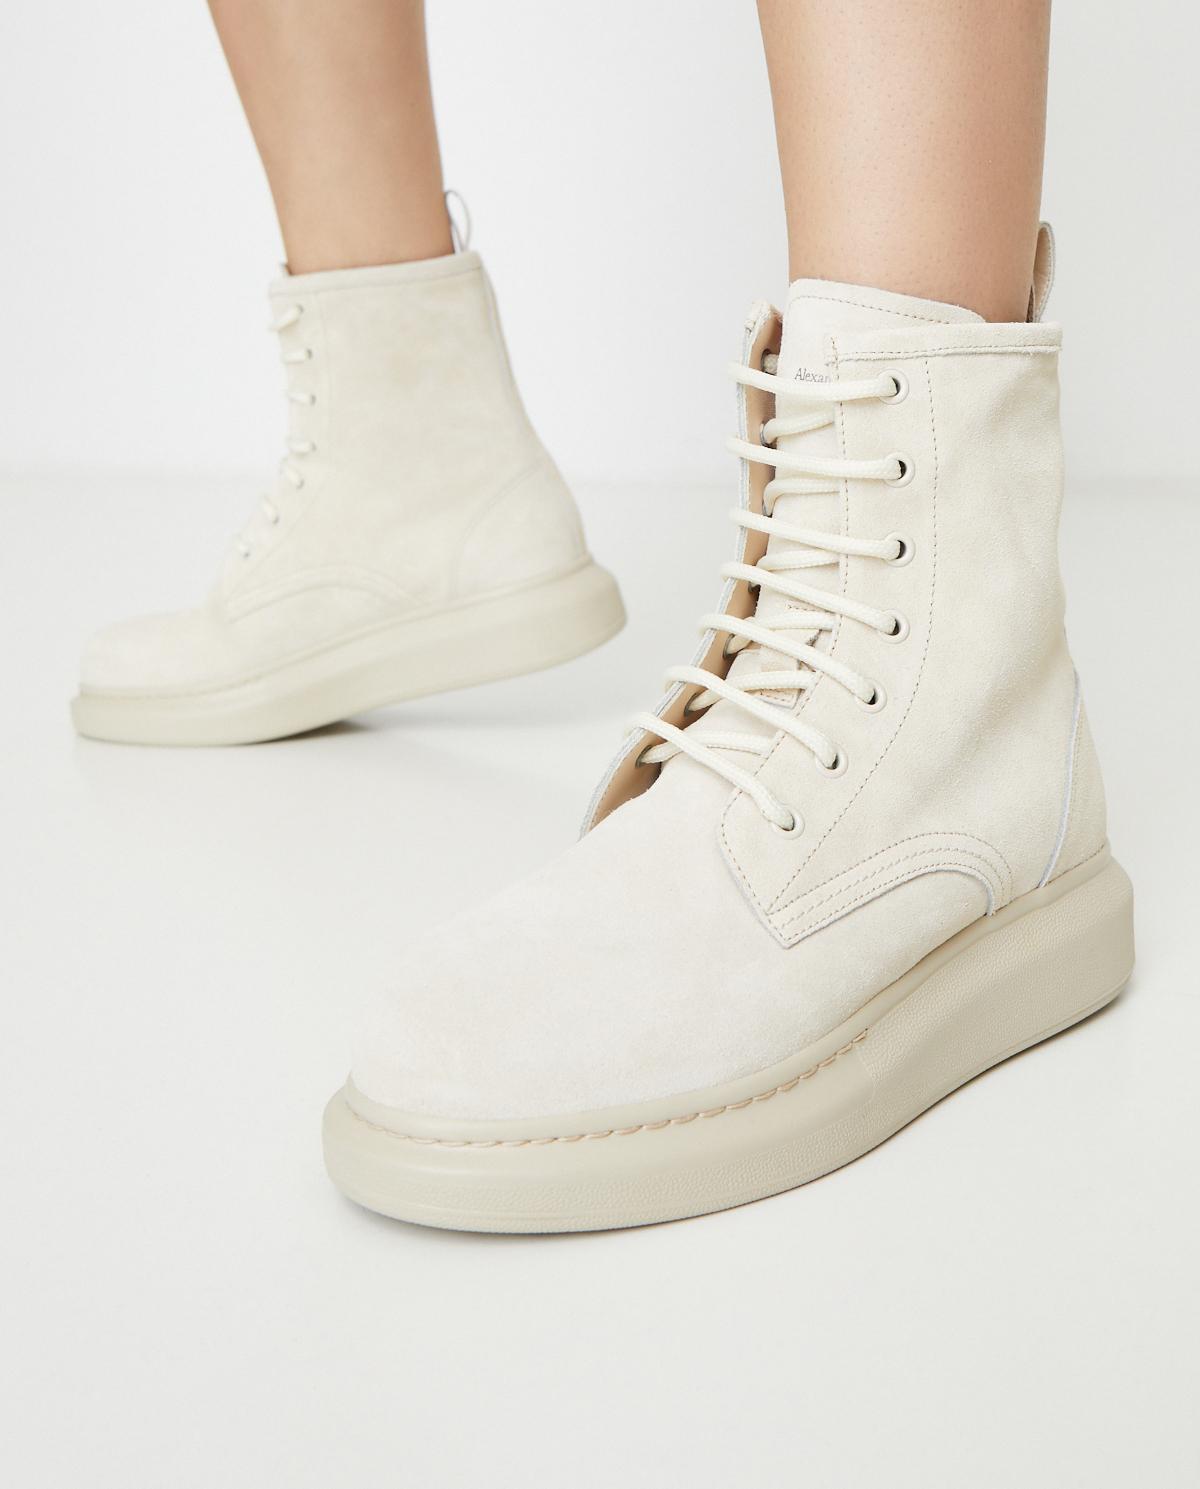 Skórzane buty za kostkę Alexander McQueen 586394 WHXK1 2222